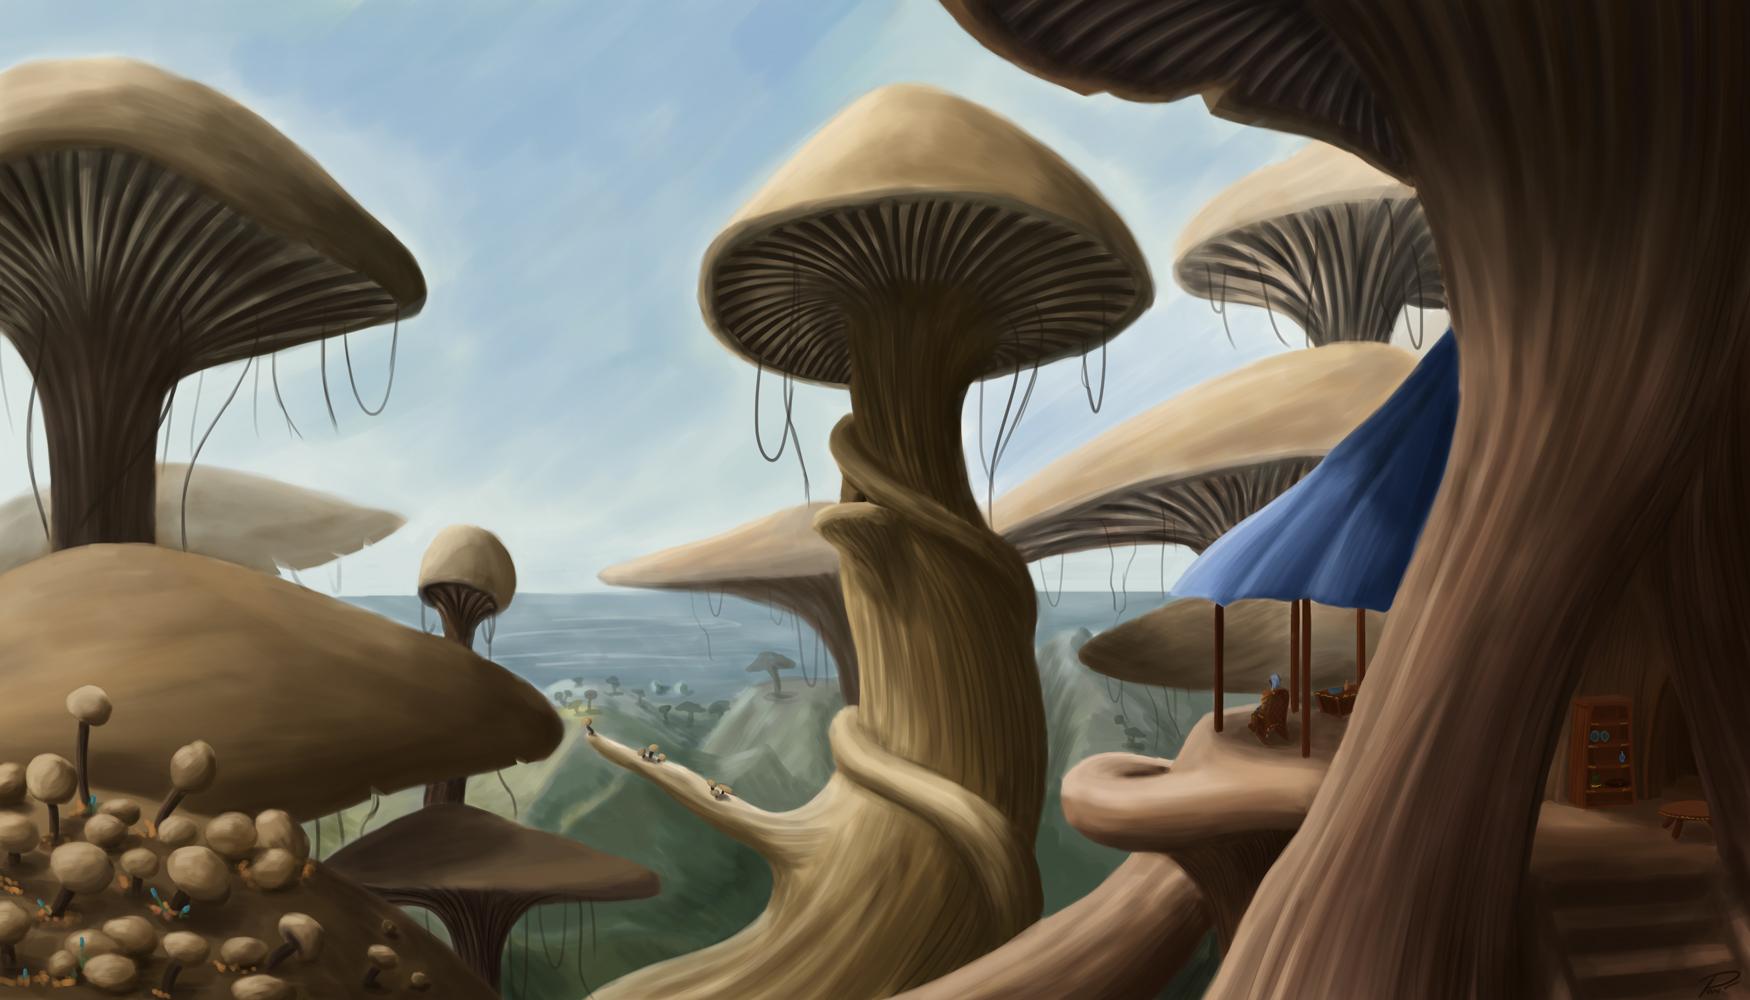 Morrowind – More Mushrooms